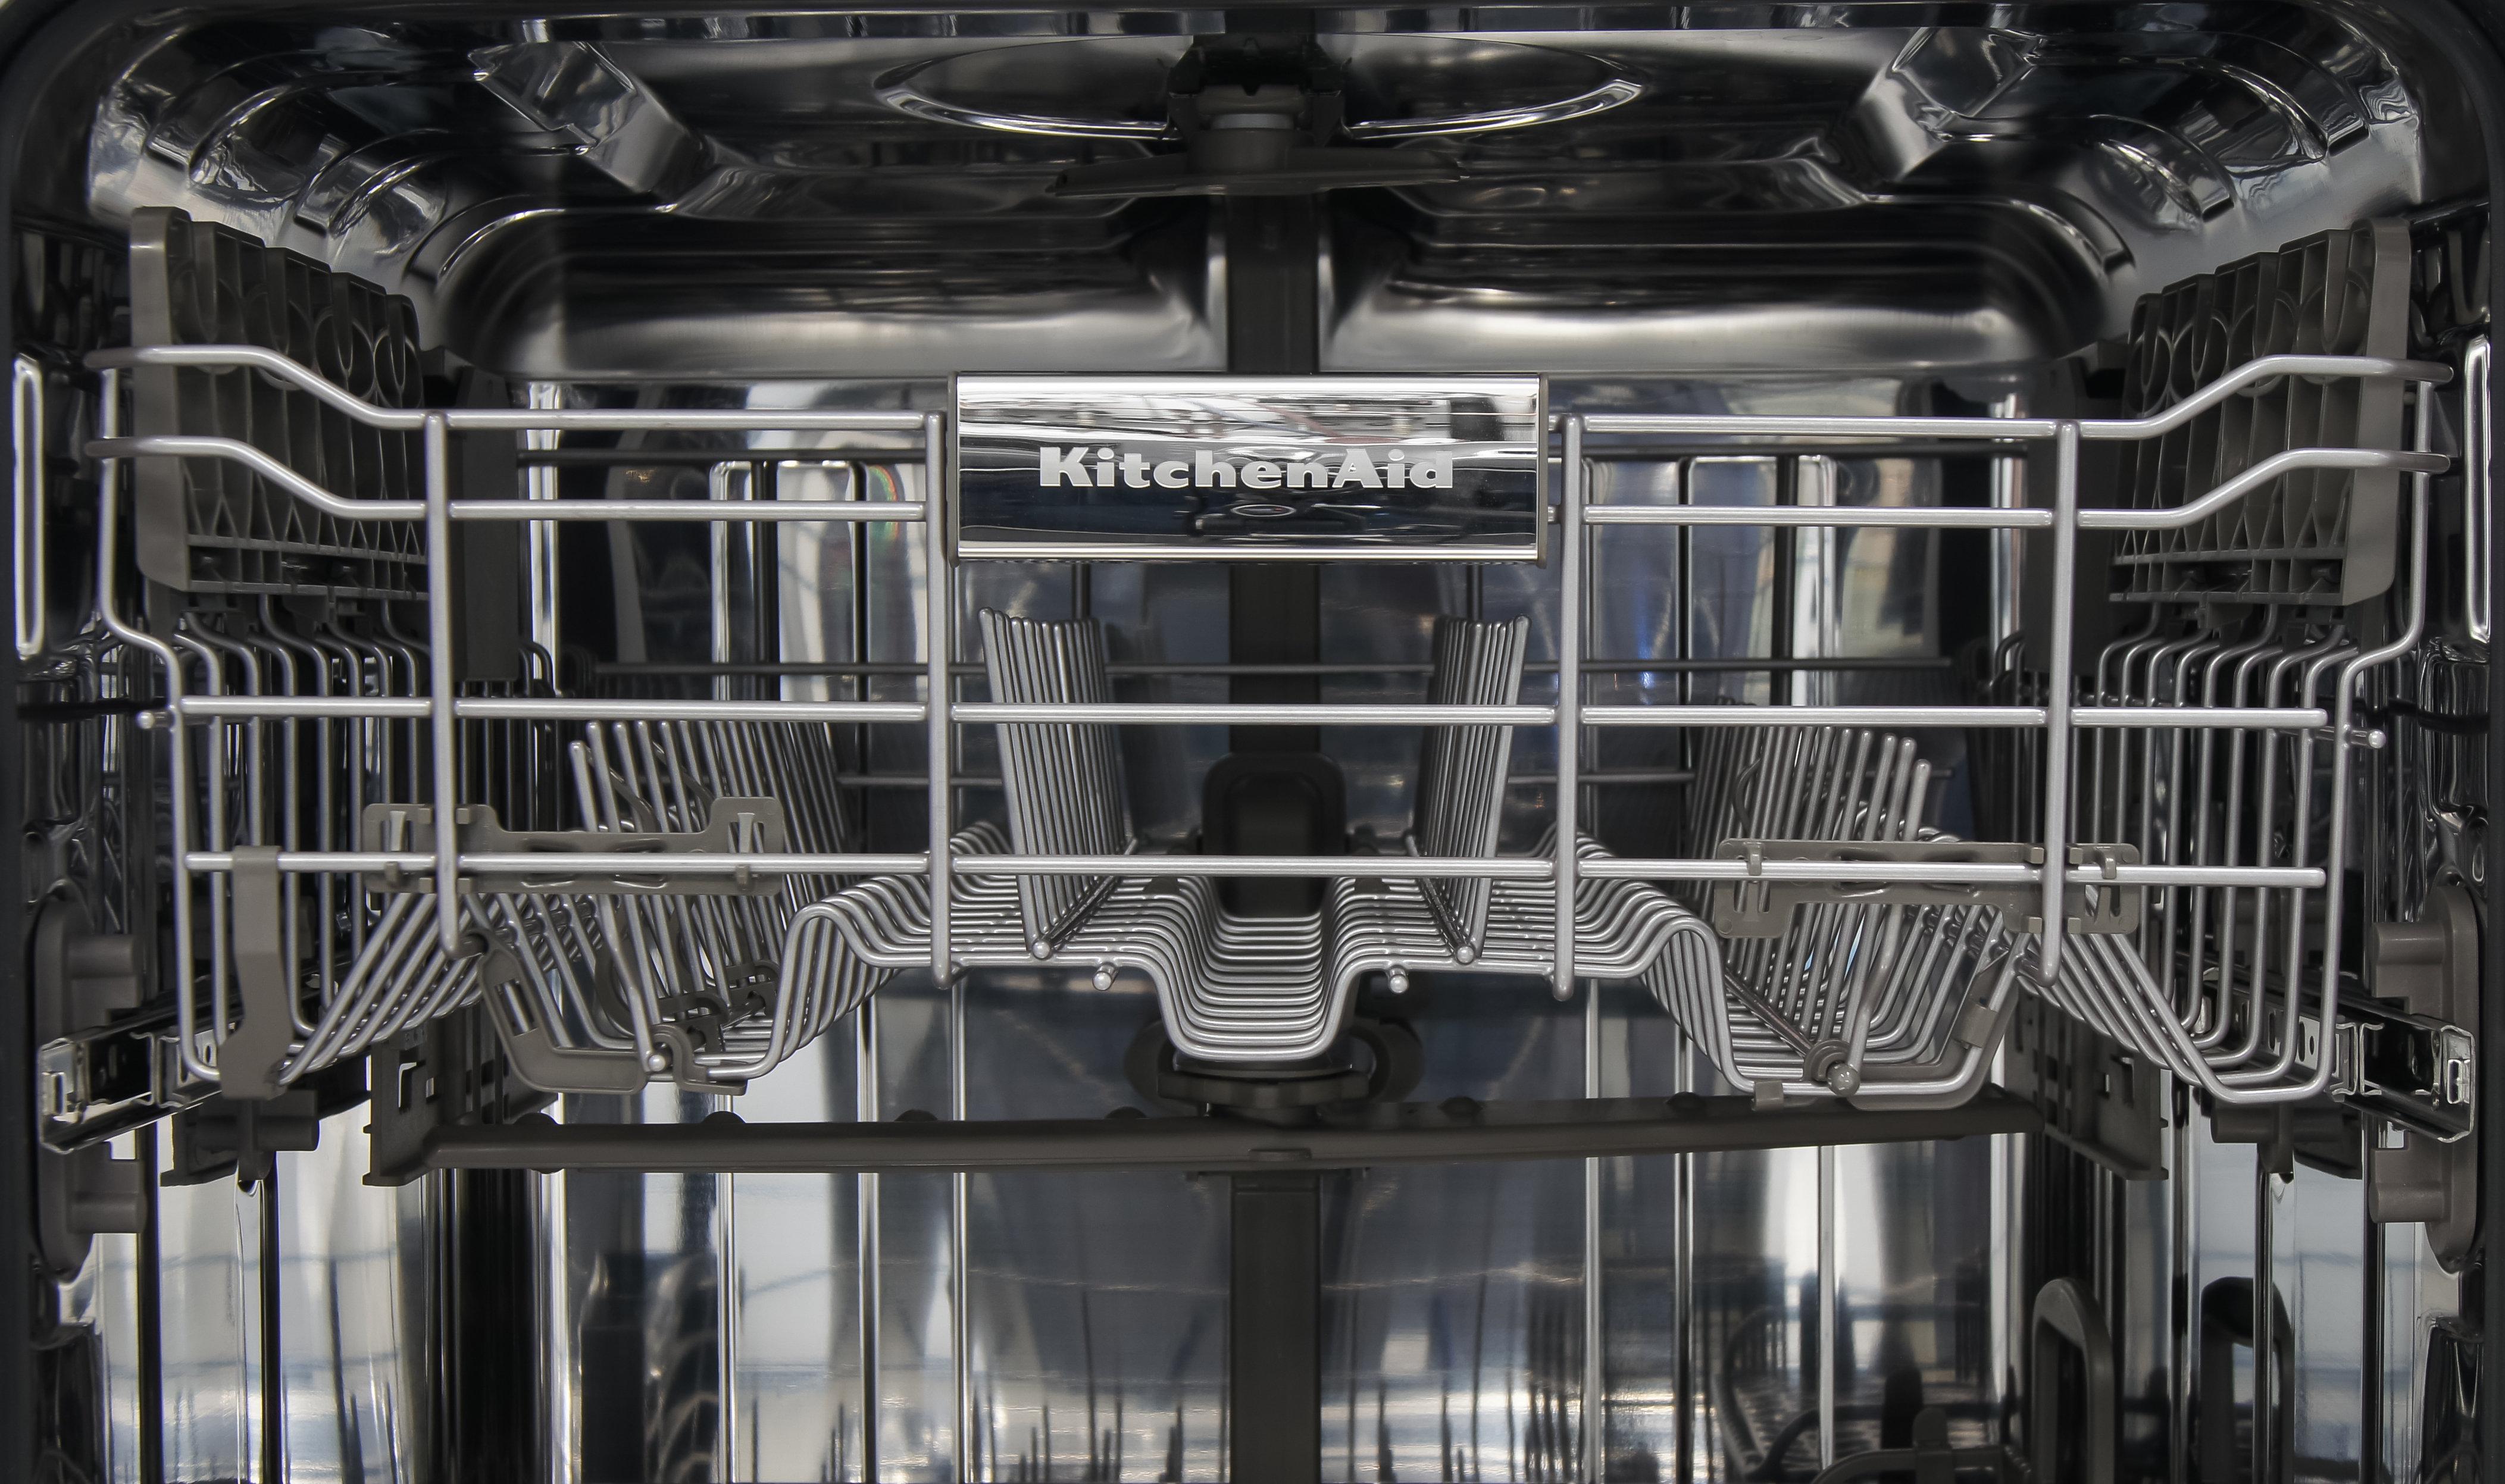 KitchenAid KDTM354DSS top rack closeup